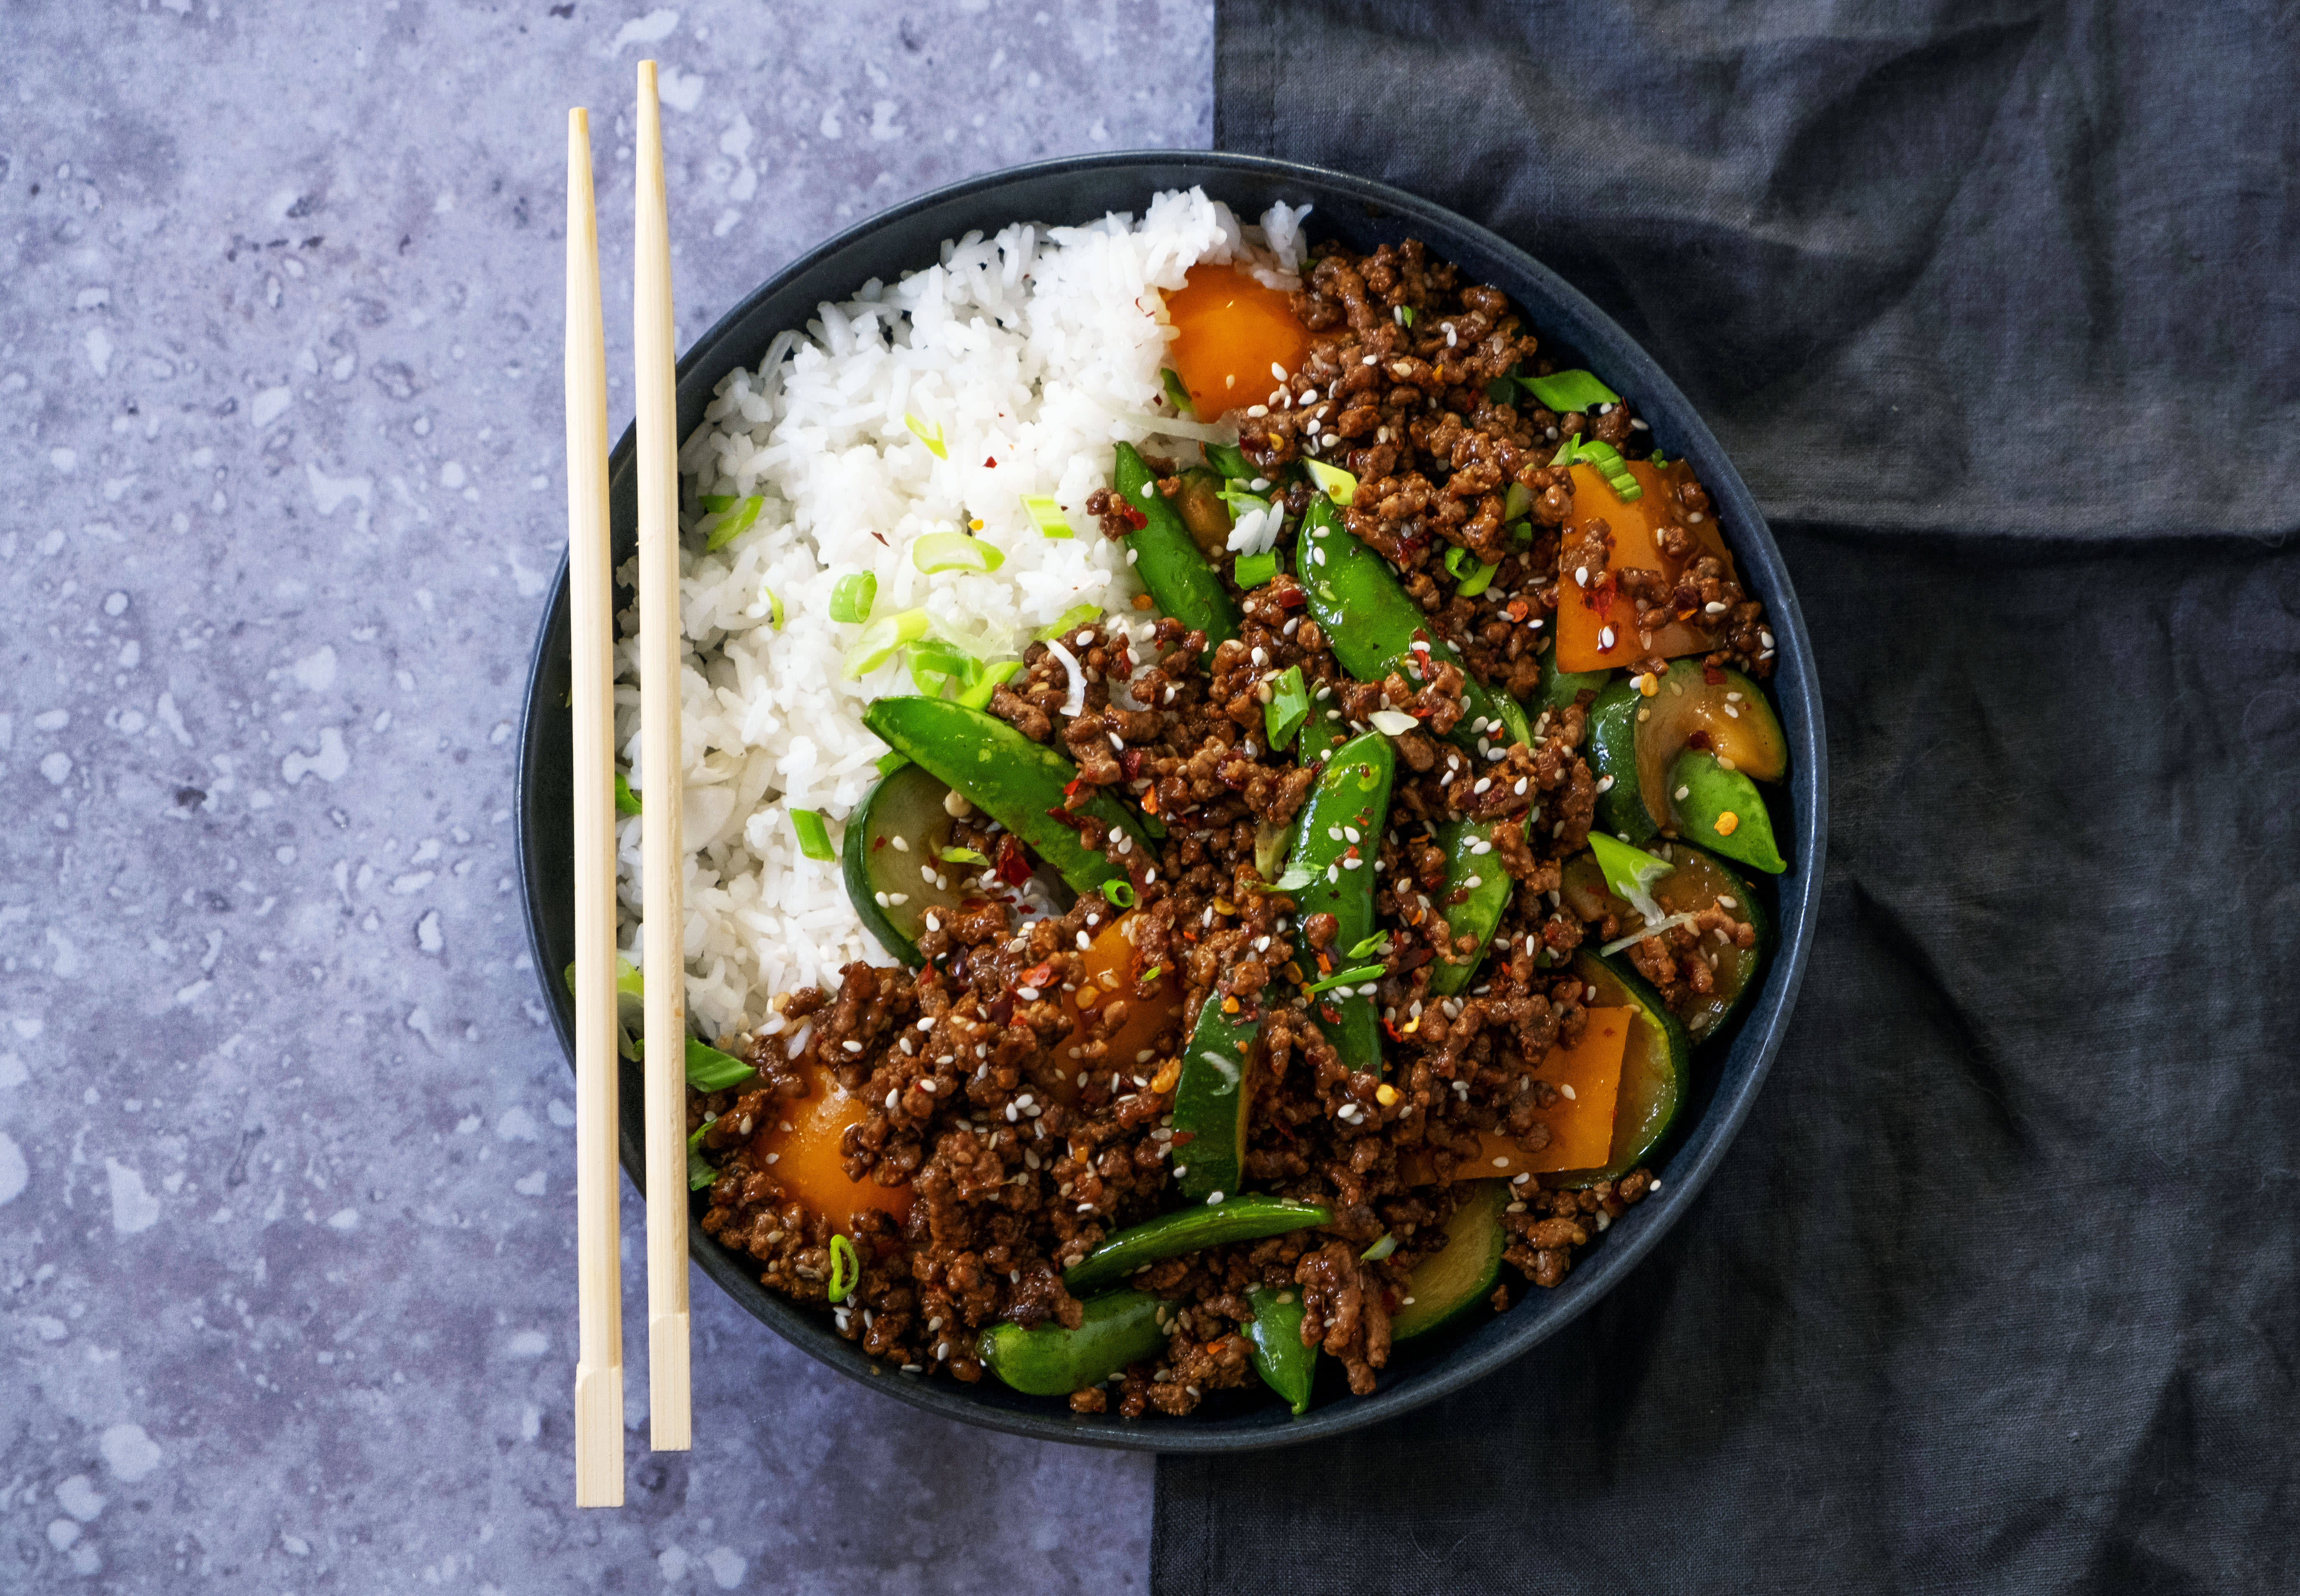 Crunchy Korean Beef Mince and Veggie Stir Fry with Jasmine Rice